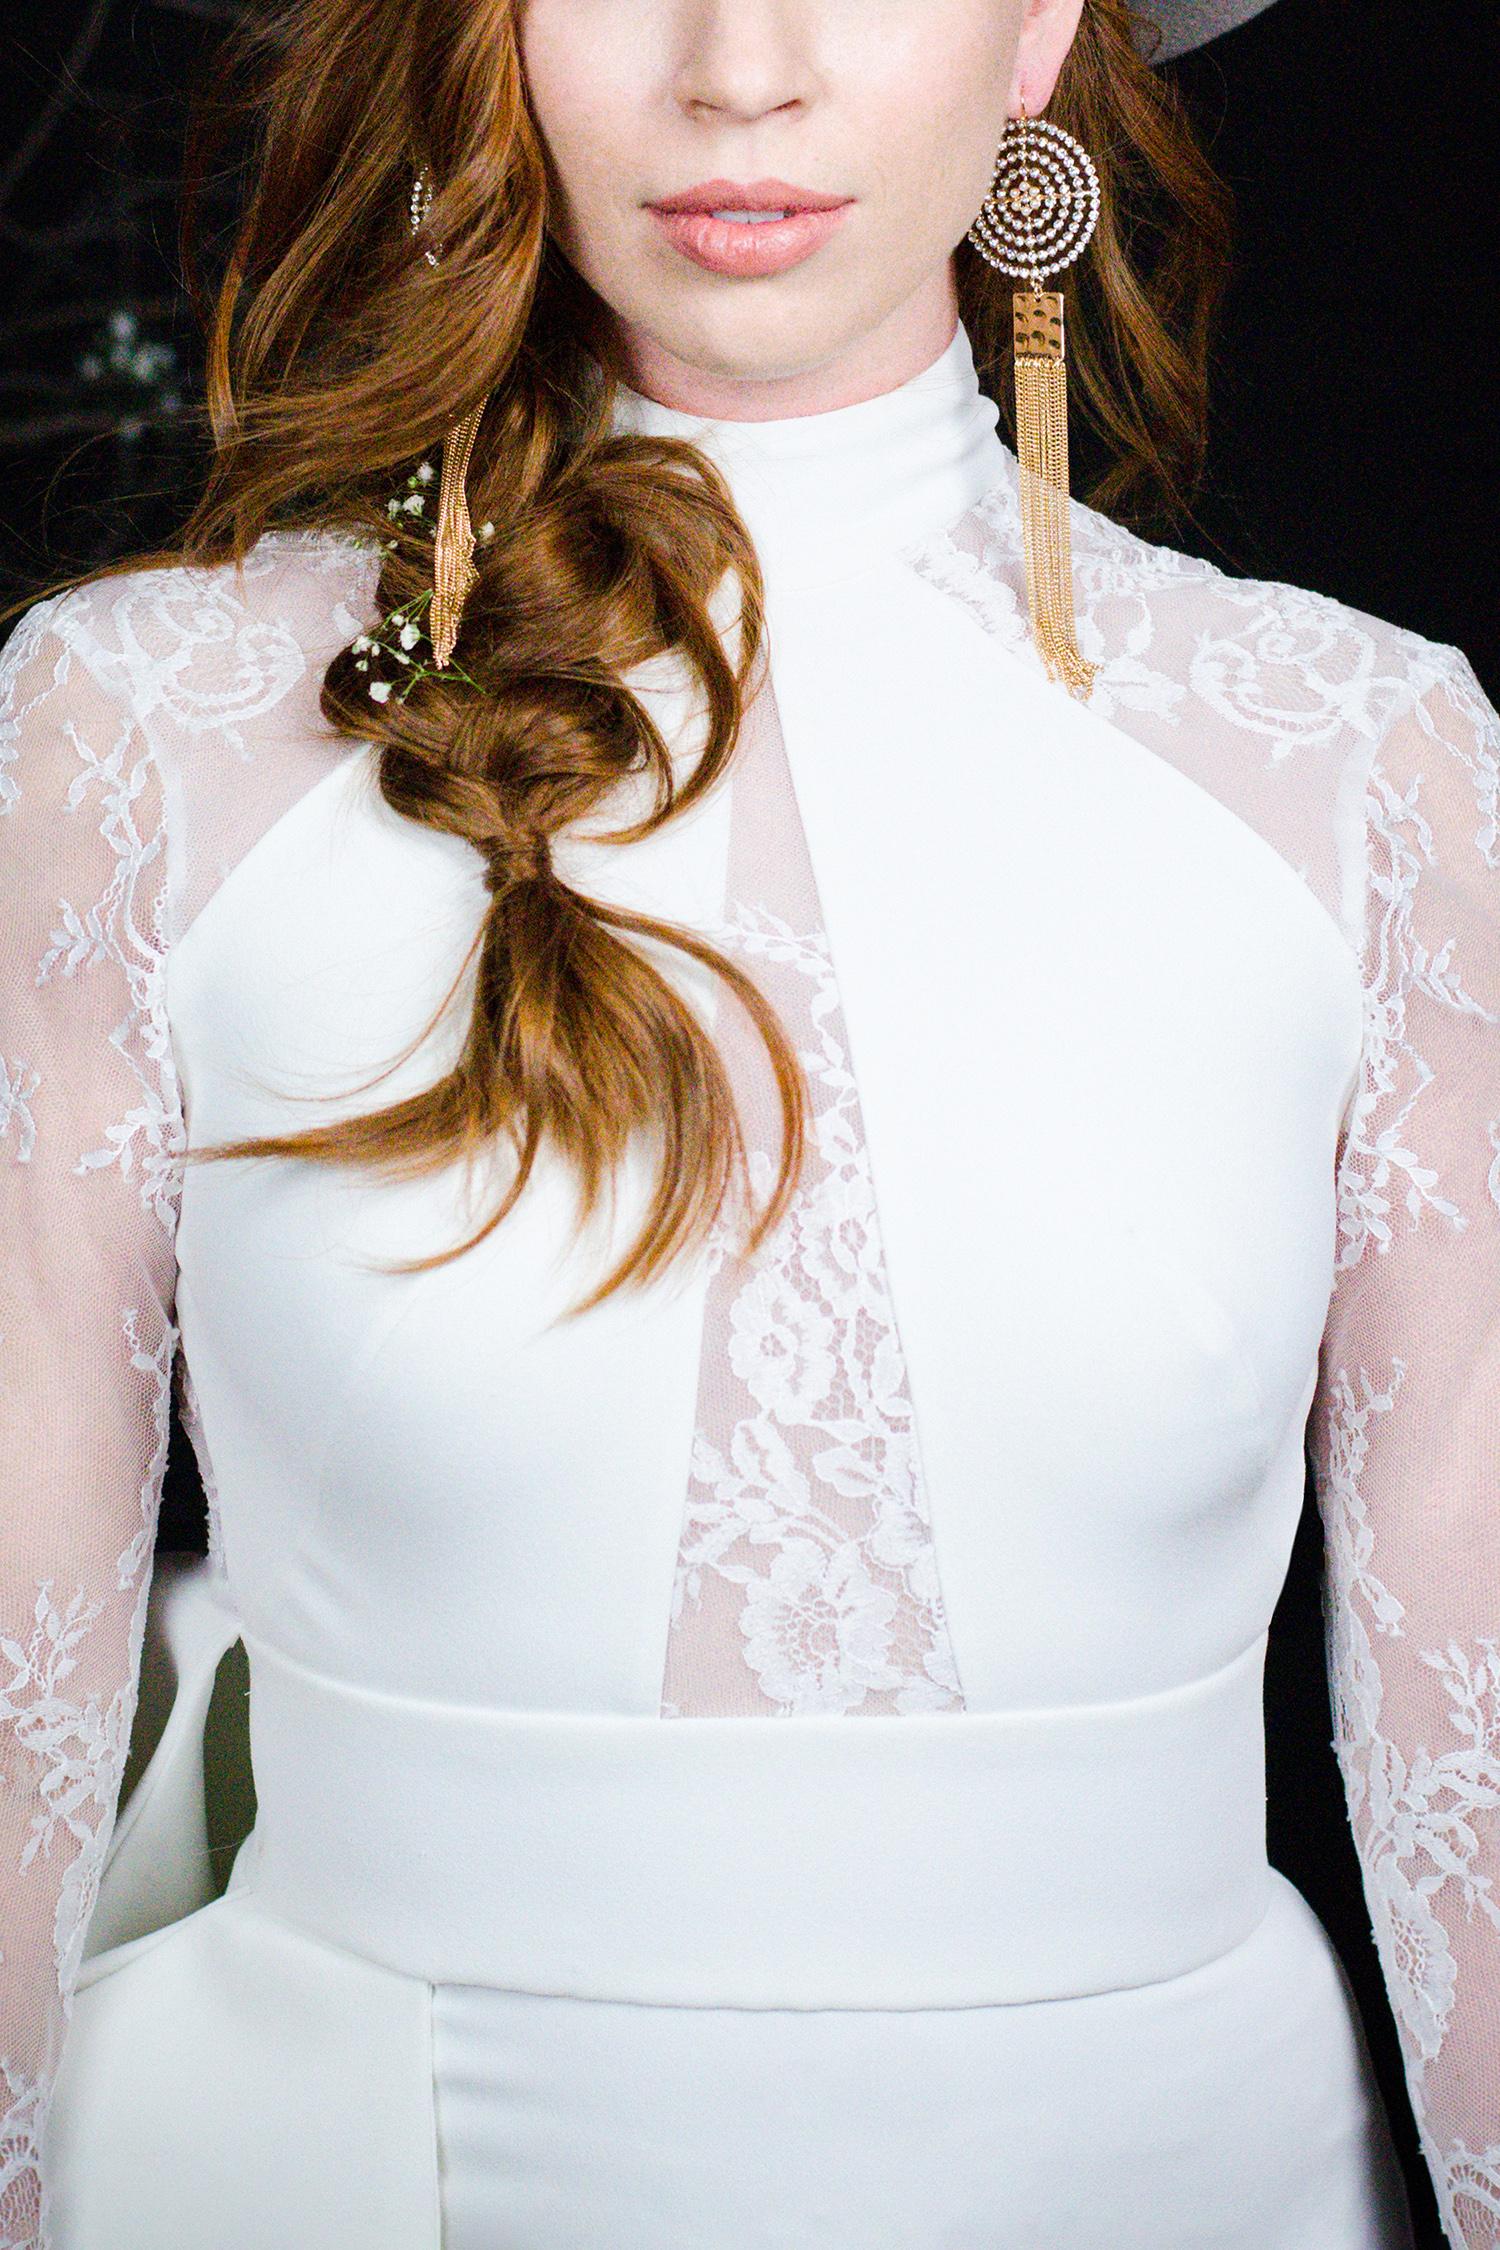 sv-bridal-whisky diamonds-dolly-01.jpg